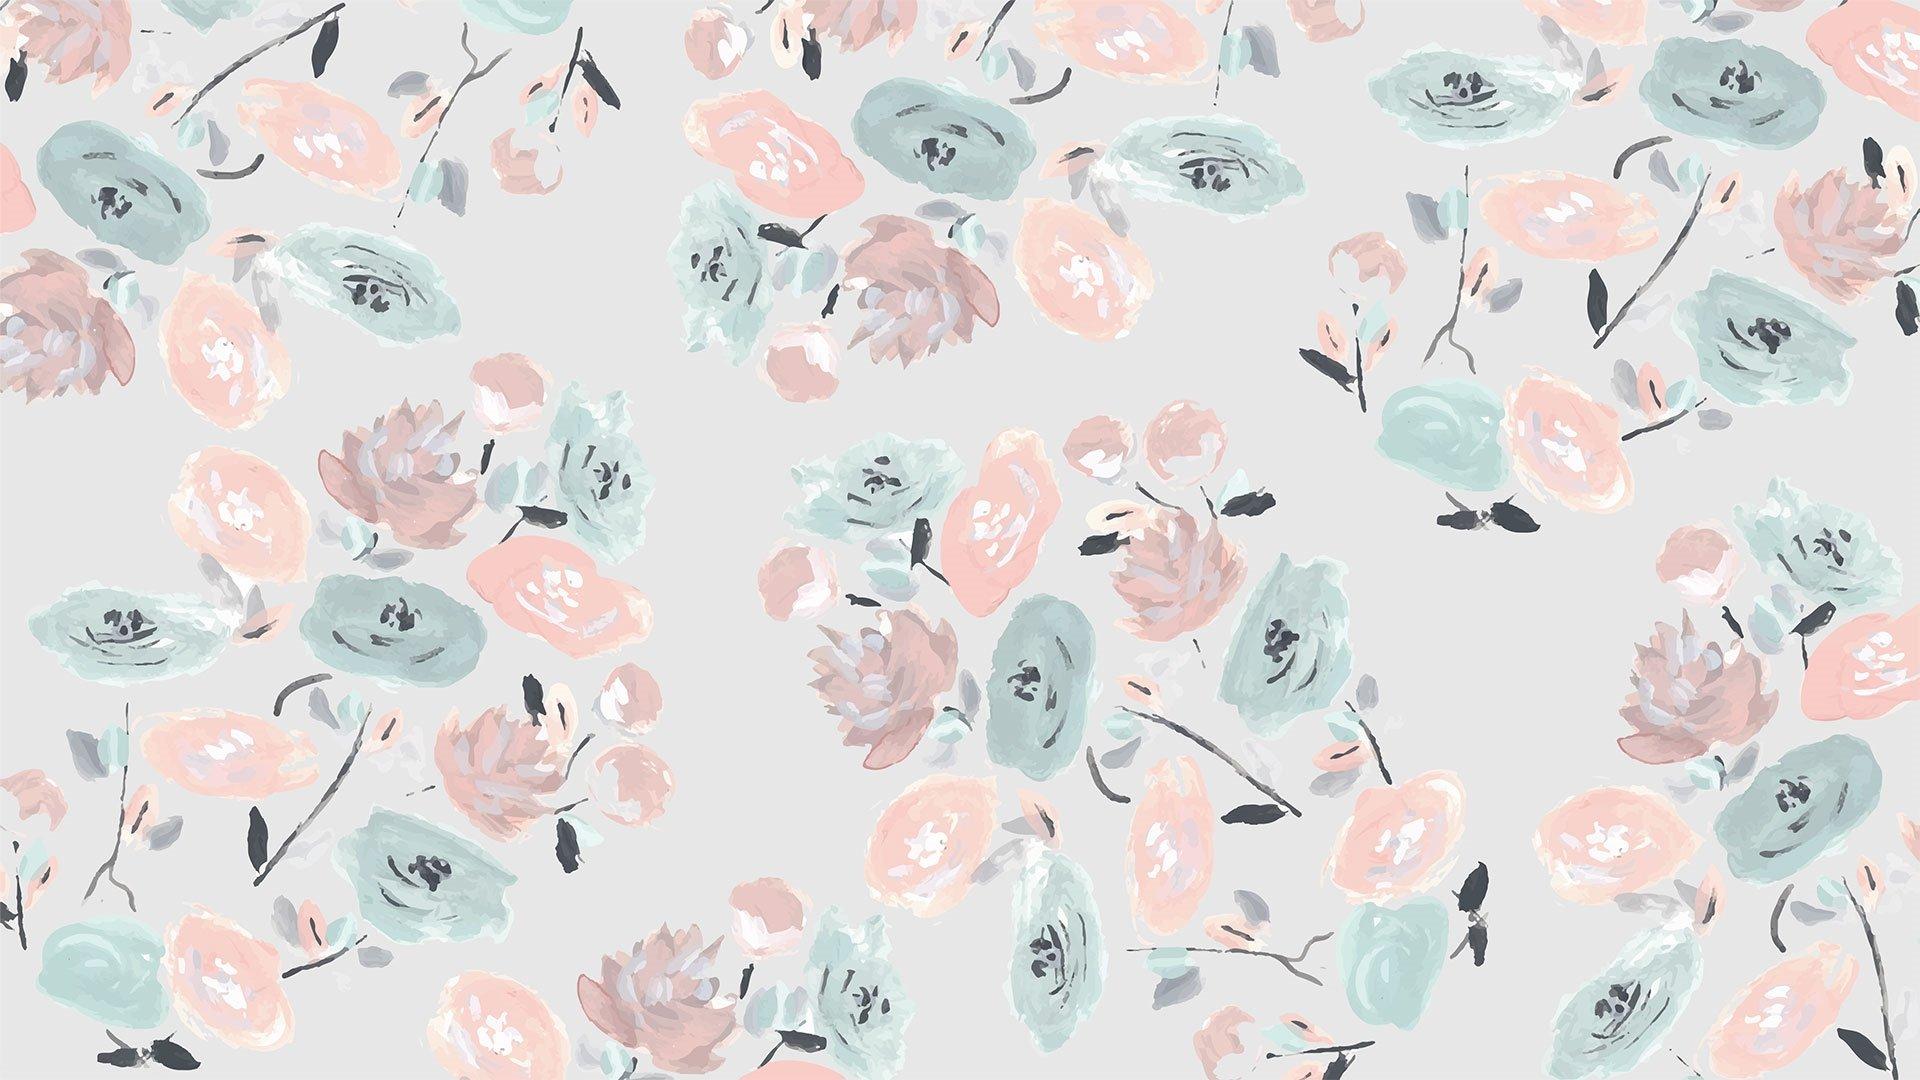 Pastel Kawaii Wallpaper Pic